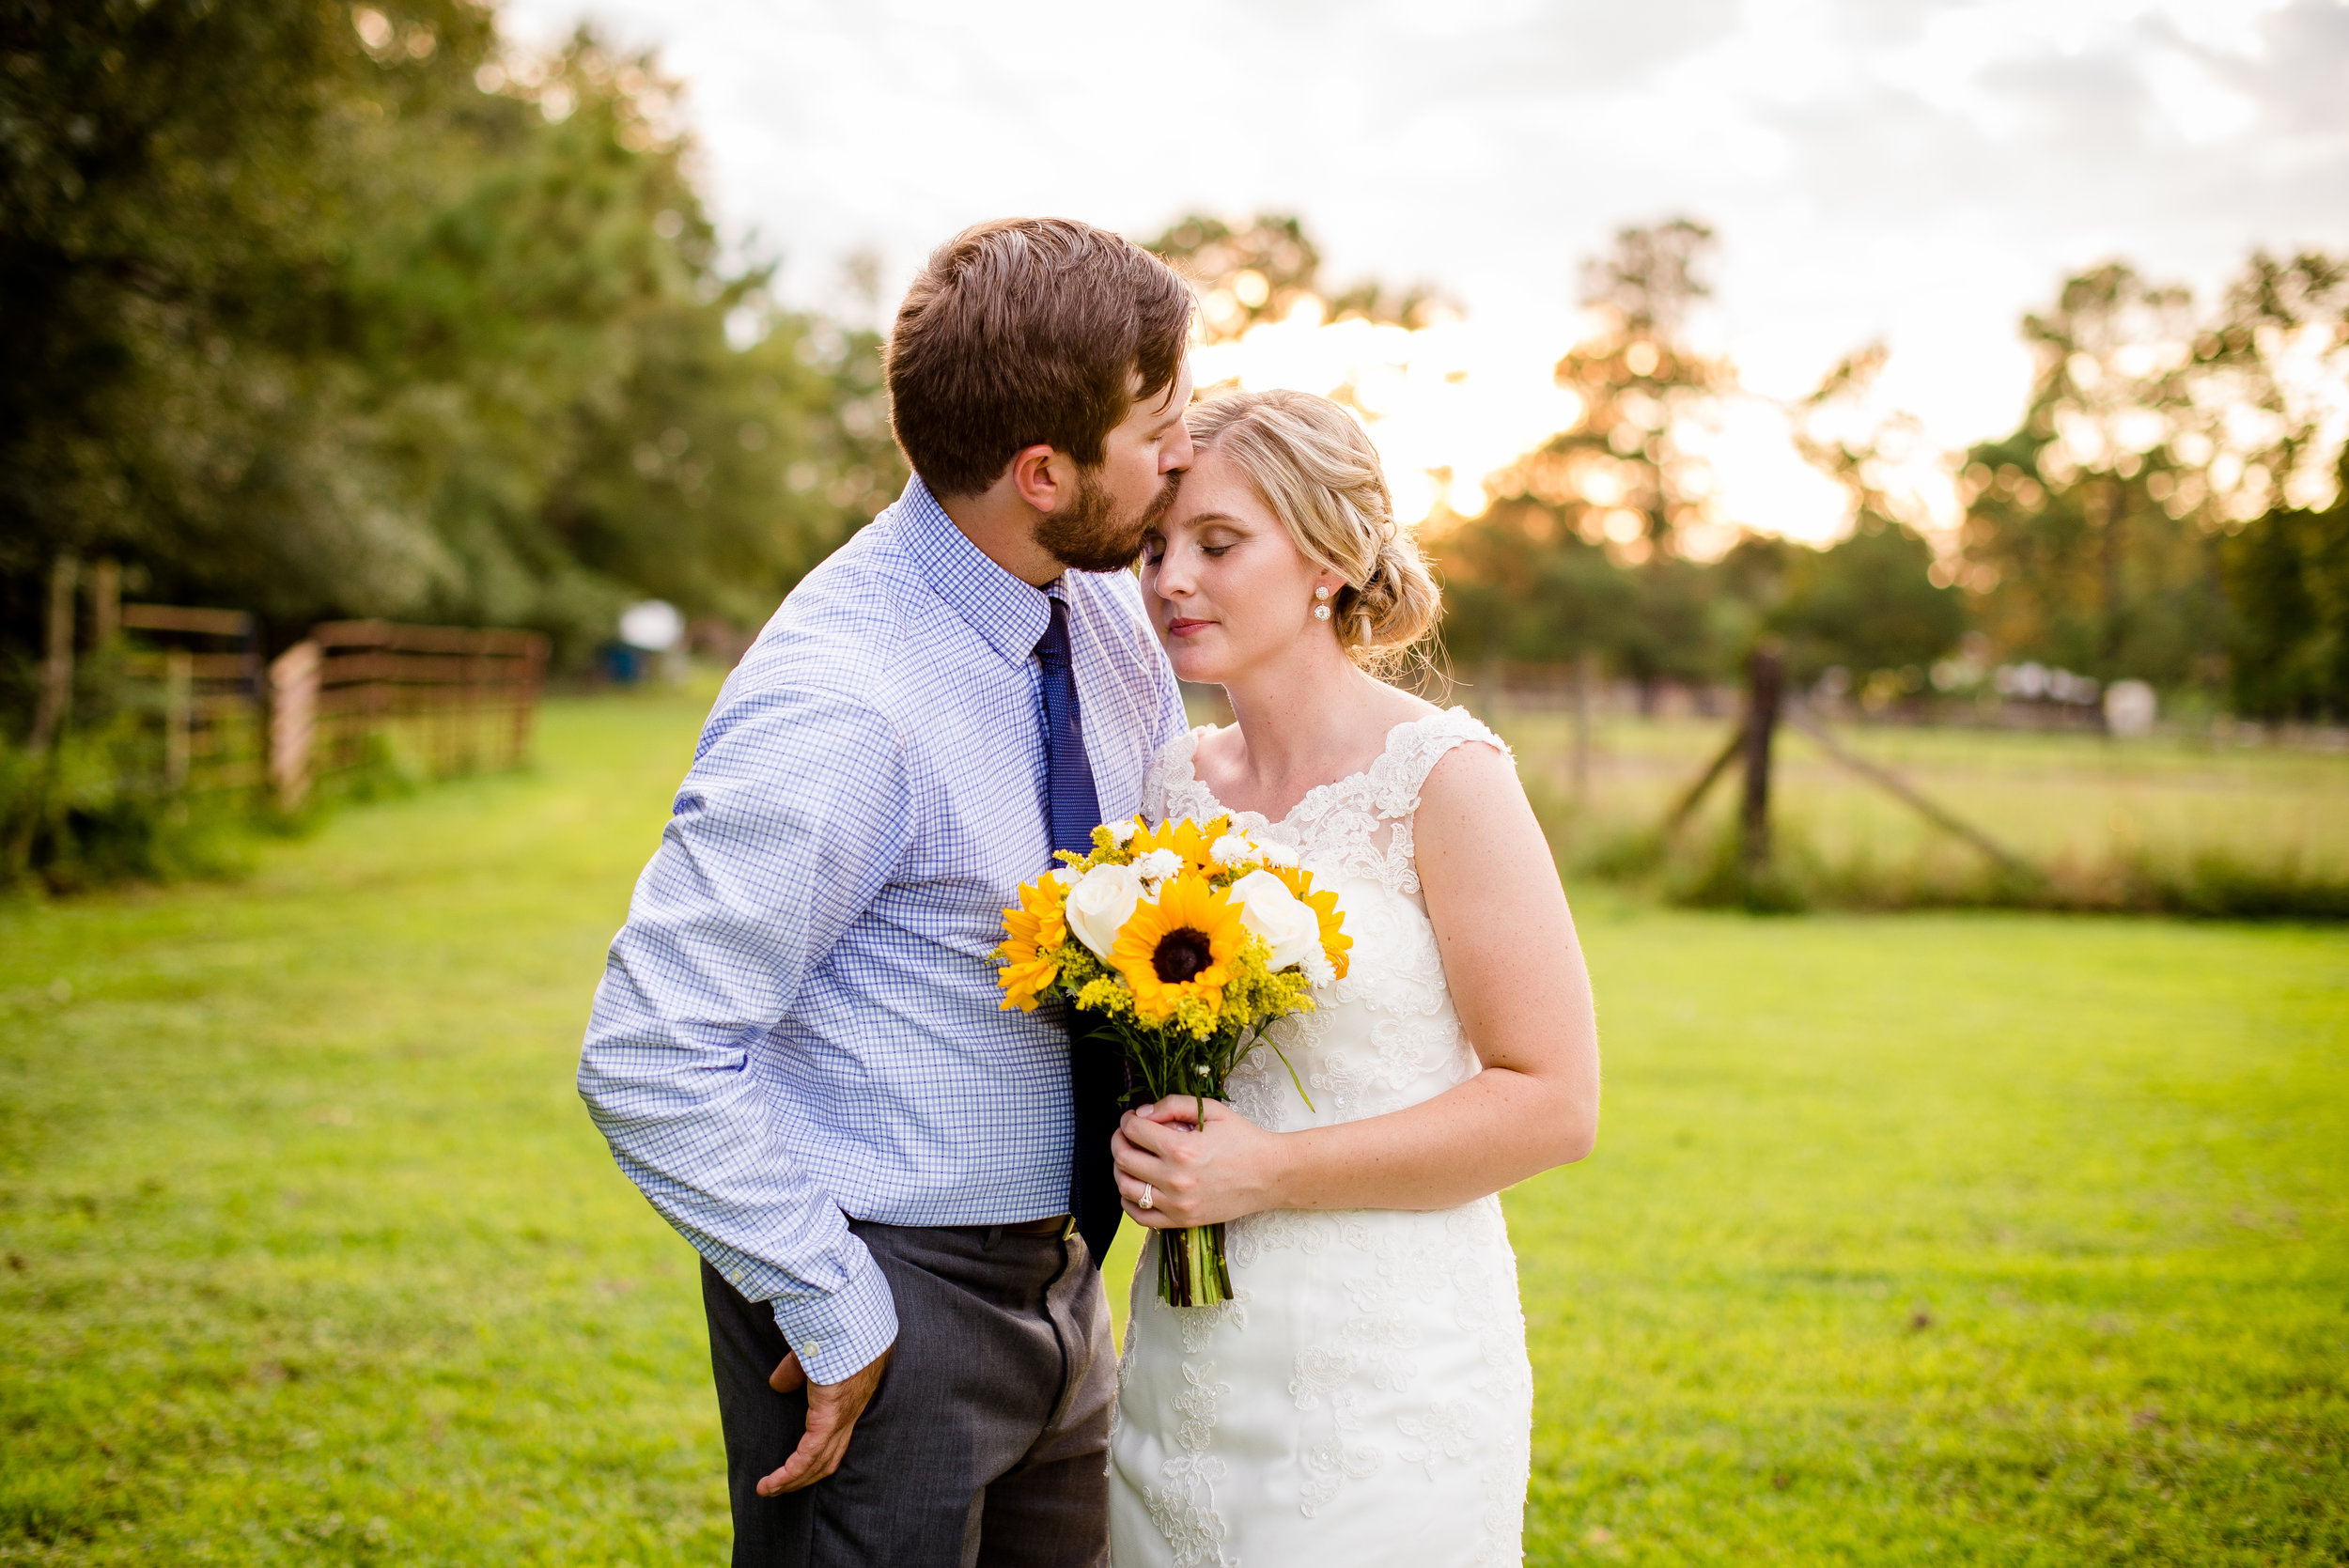 Golden-Hour-Bride-Groom-Wedding-Photos-Charleston-South-Carolina-Oakley-Farms-and-Barn